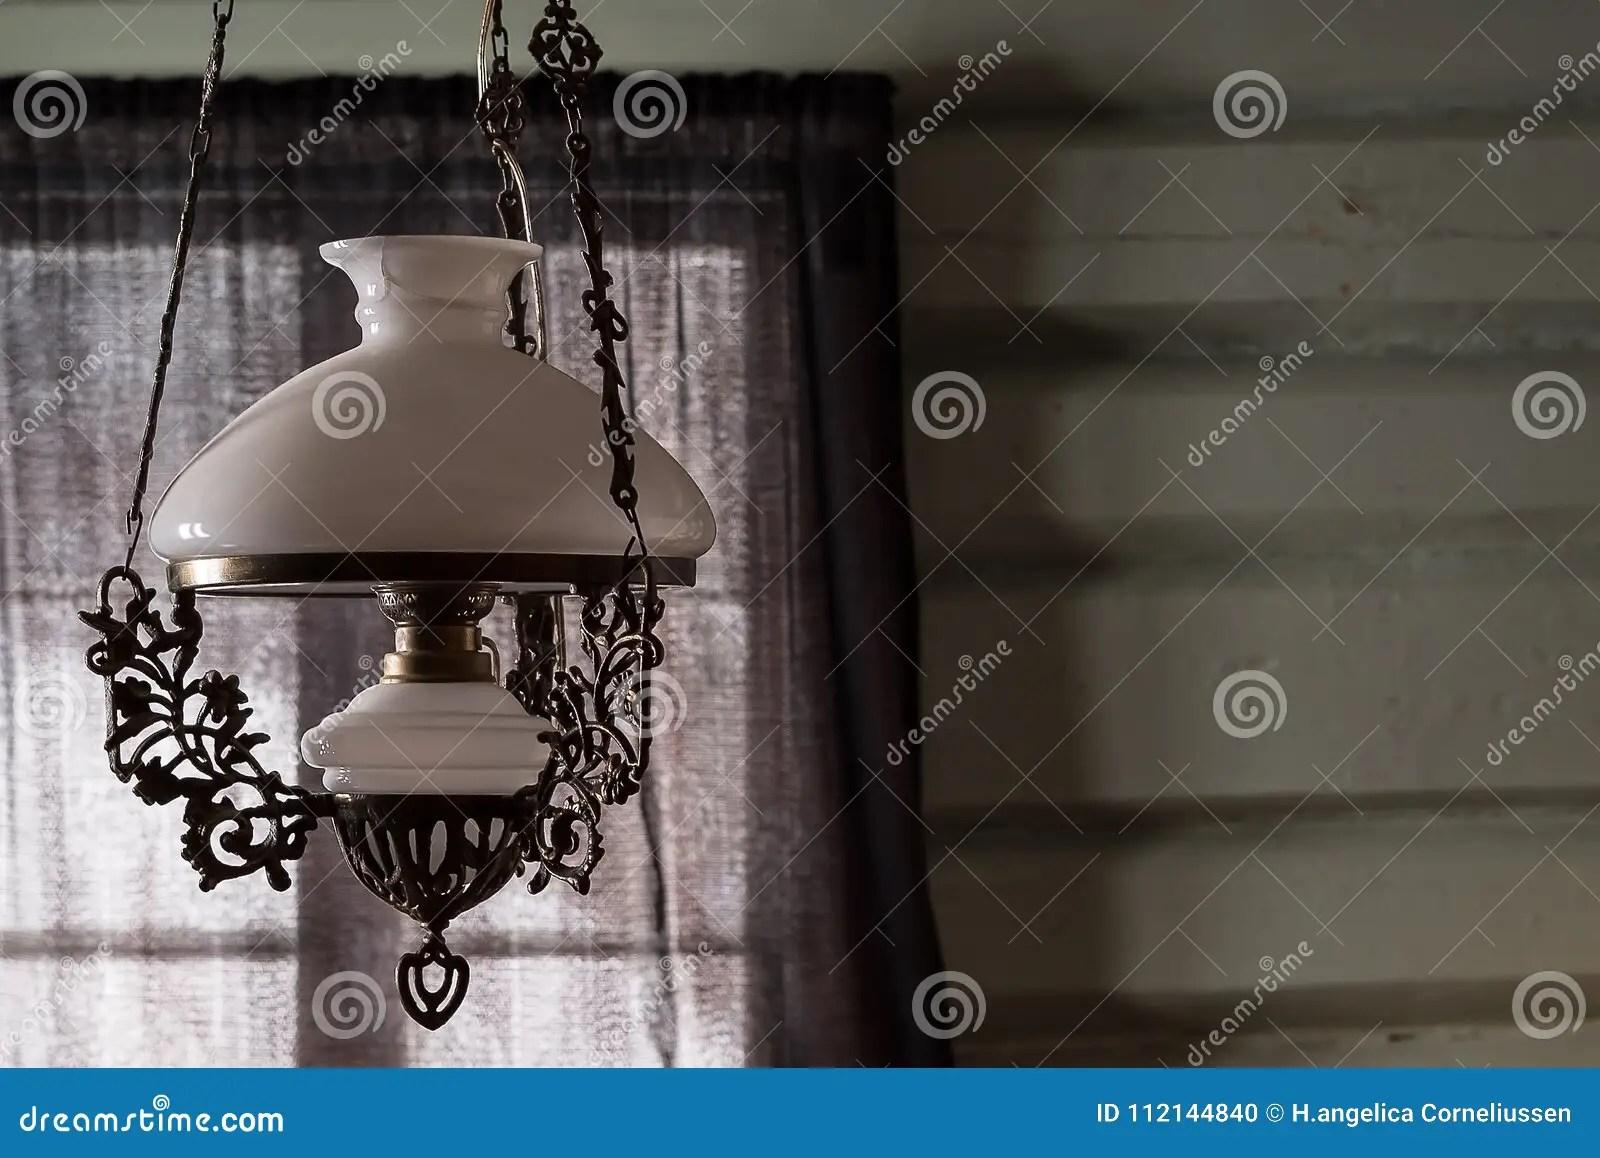 https www dreamstime com old antique glass lamp hanging ceiling rustic living room elegant vintage lighting brass ornament copy space image112144840